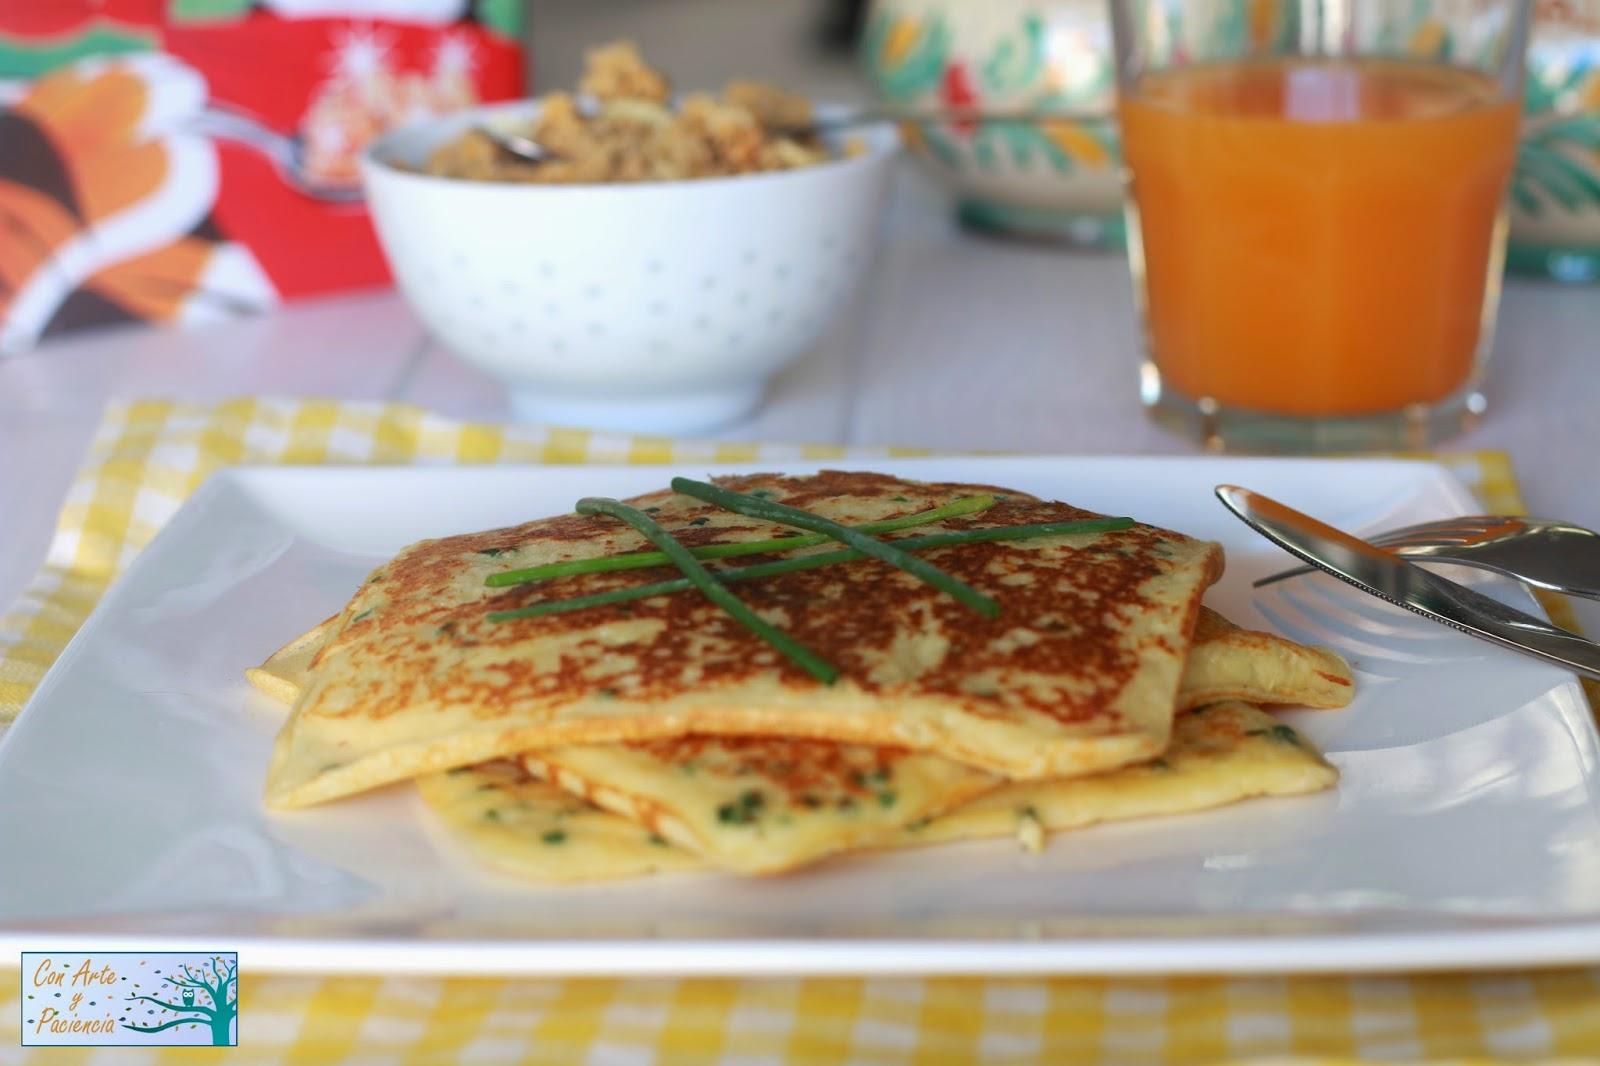 tortitas,pancakes,cebollino,huevo,harina,leche,huevo,egg,milk,sartén,gofres,waffles,mantequilla,desayuno,breakfast,cena,dinner,tomates,cherry,revueltos,